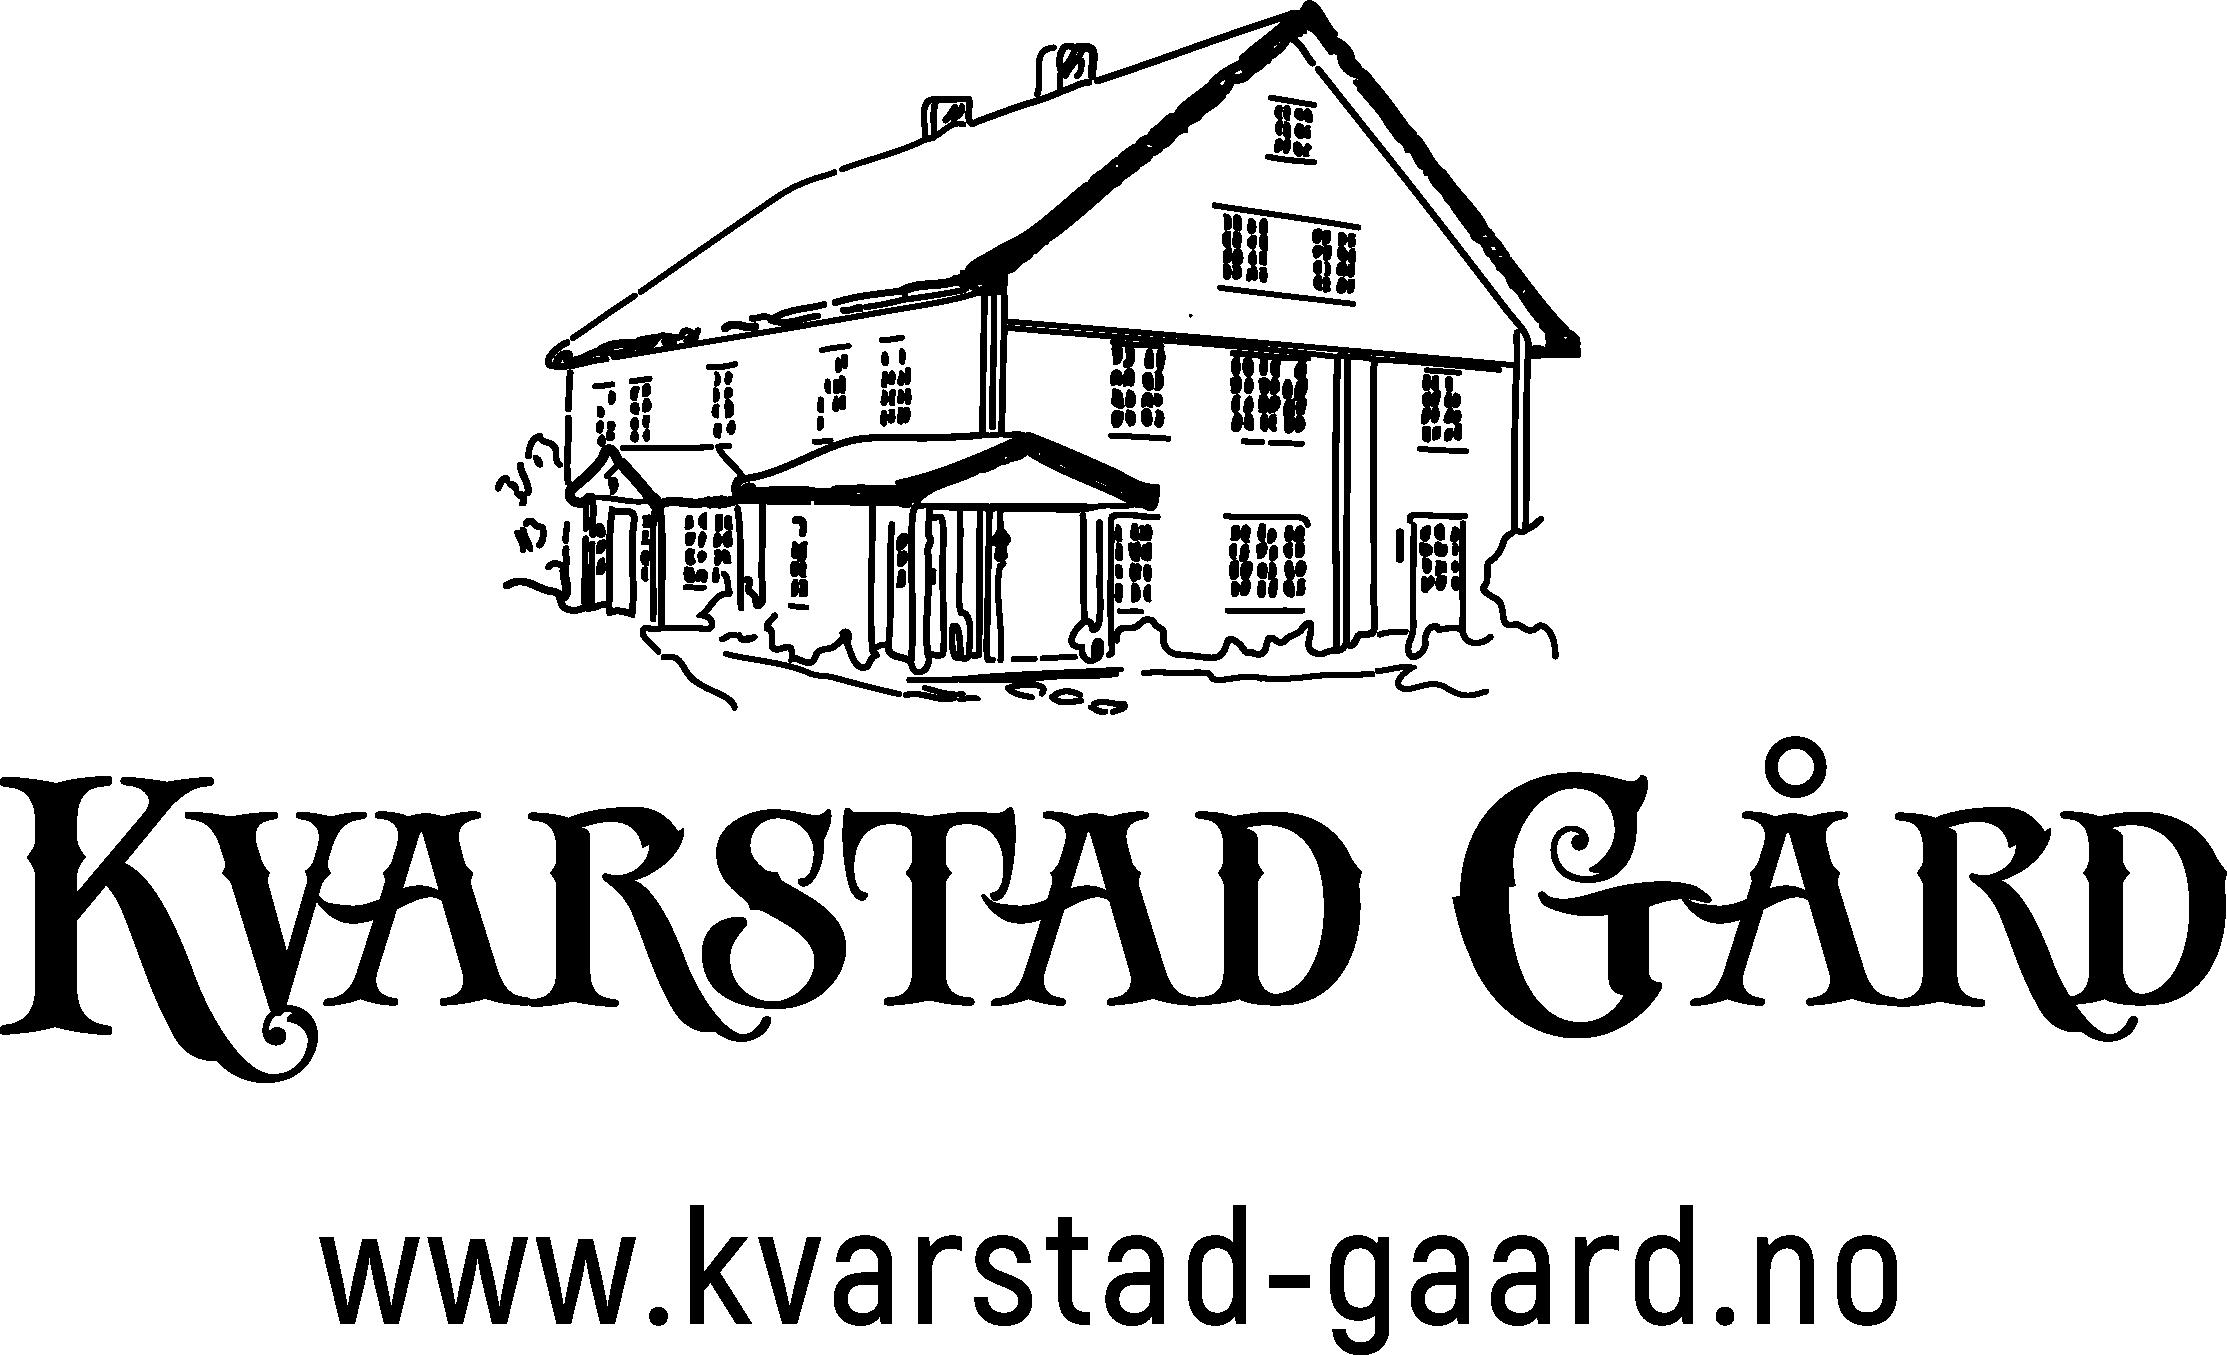 Kvarstad-gaard_logo.png